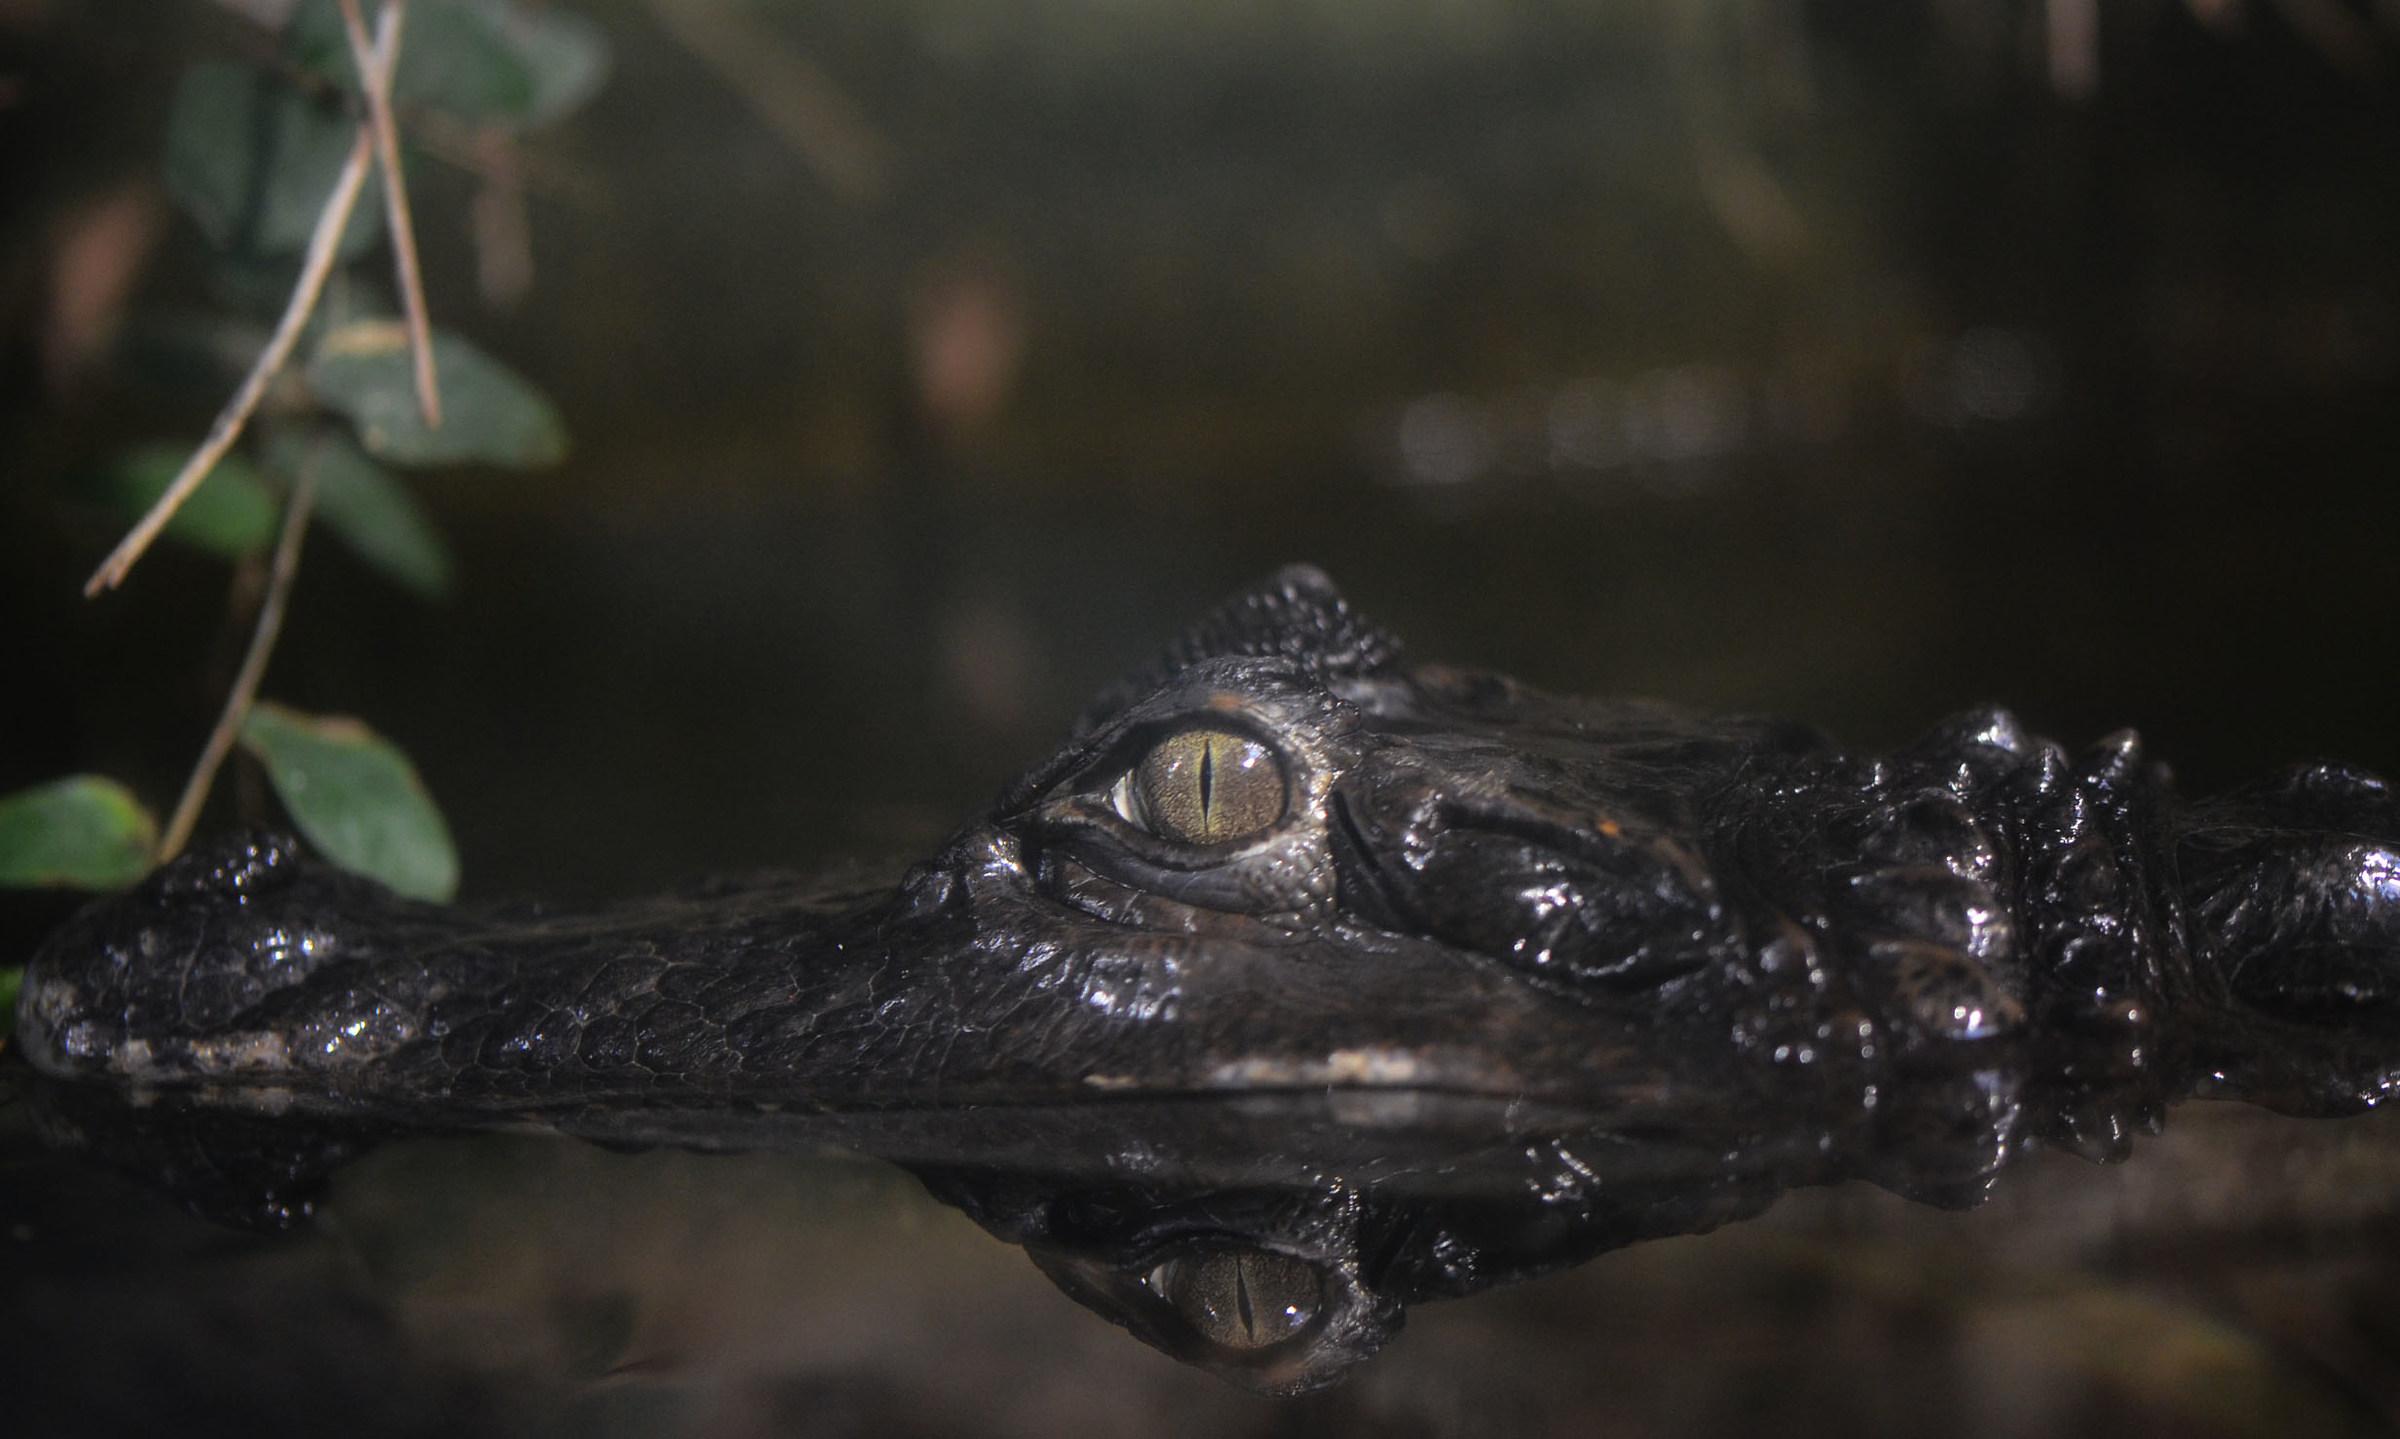 The crocodile is like ......